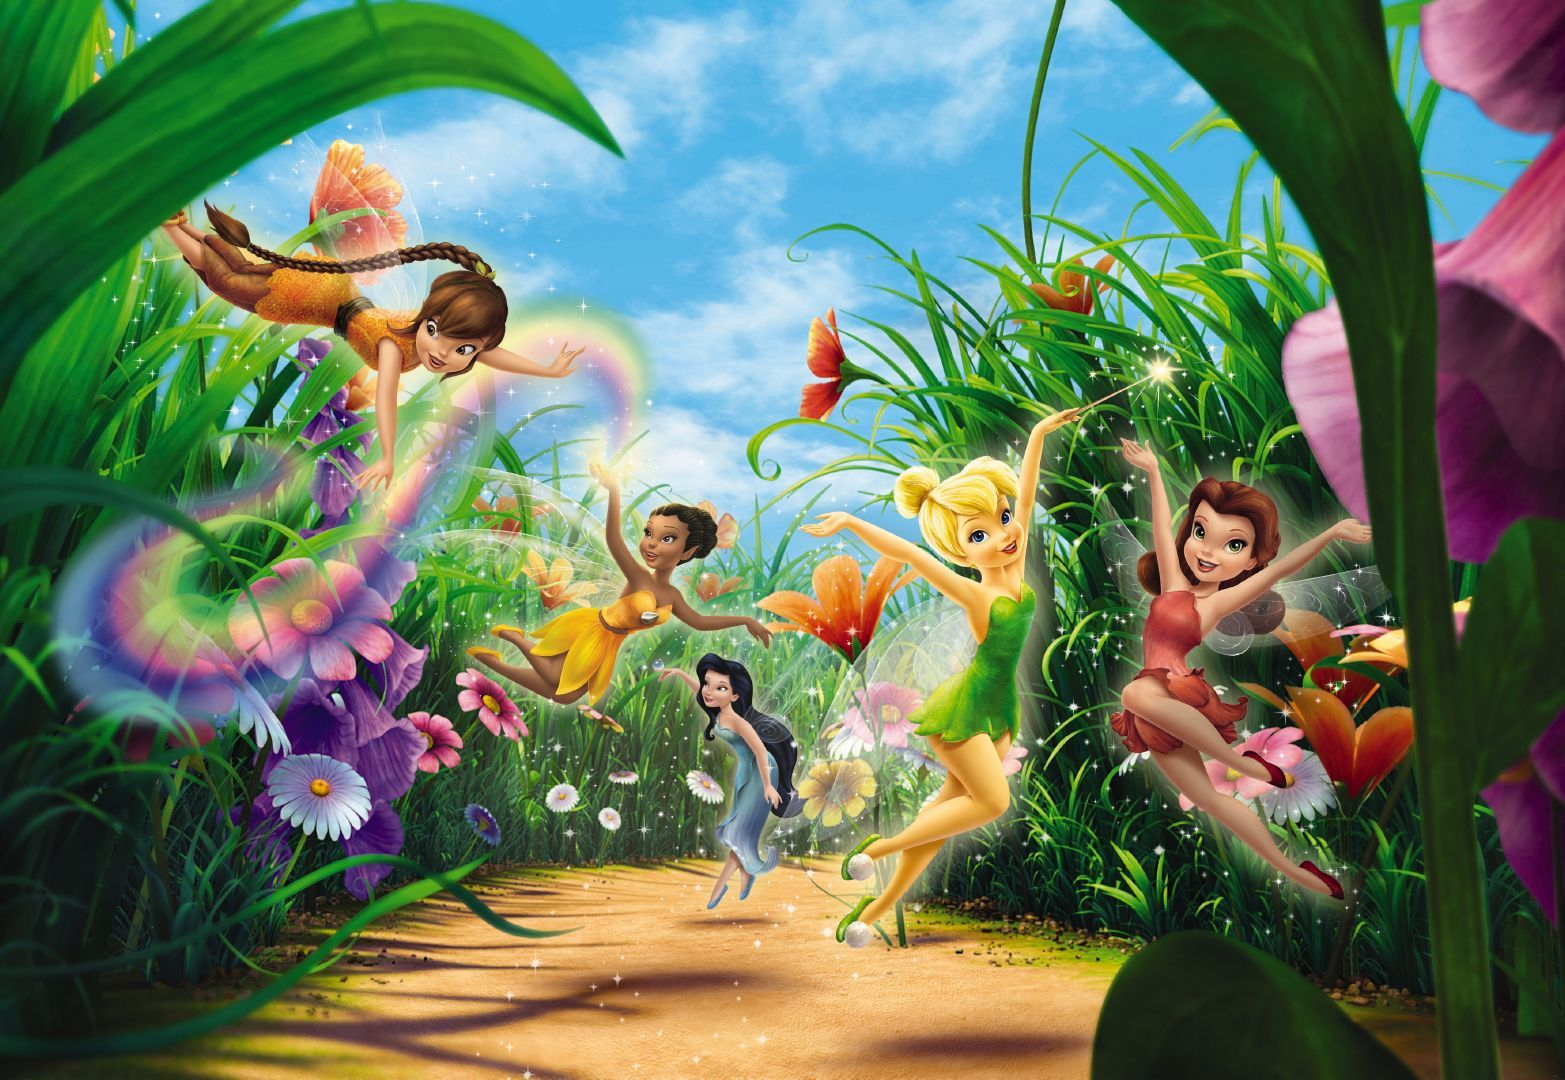 Di disney frozen wall murals - Wall Mural Photo Wallpaper Fairies In The Meadow For Bedroom Disney Tinker Bell Ebay